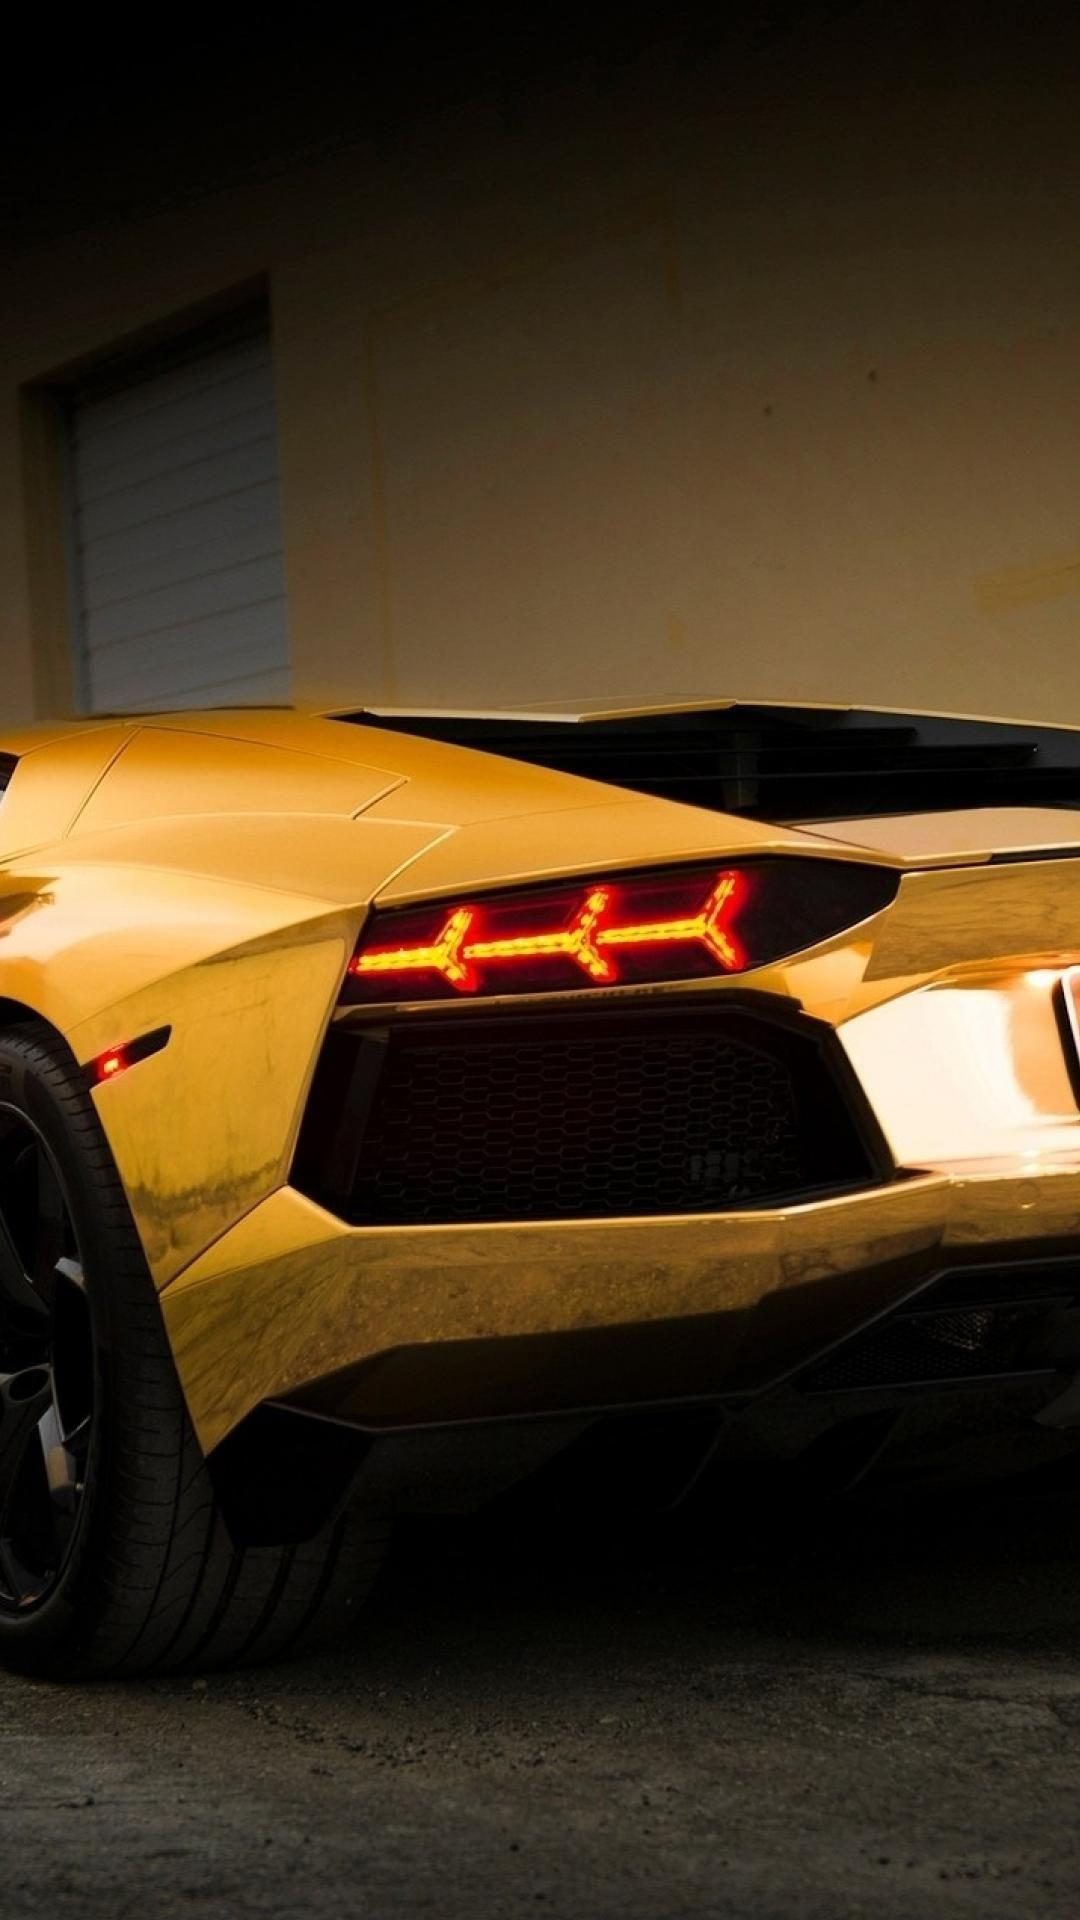 1920x1080 Cool Wallpapers 1600x900 Group 94 Download 3840x2160 Gold Chrome Lamborghini Aventador